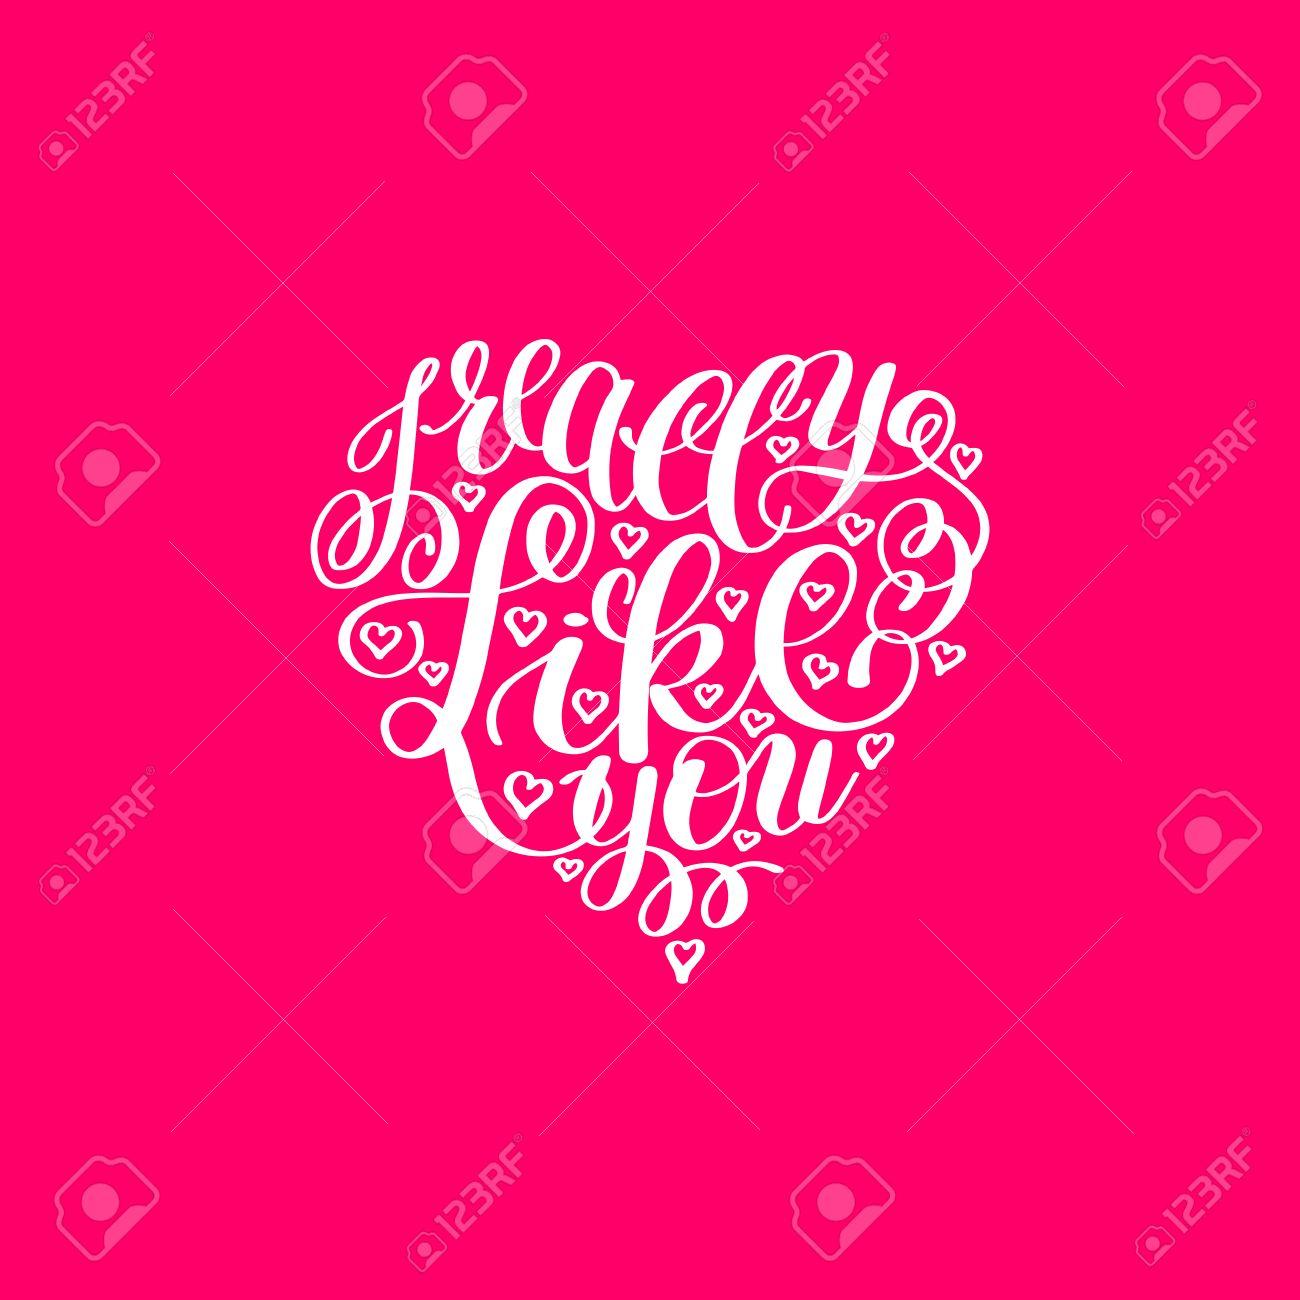 Realmente Me Gustas Carta De Amor En Forma De Corazón Texto Inglés